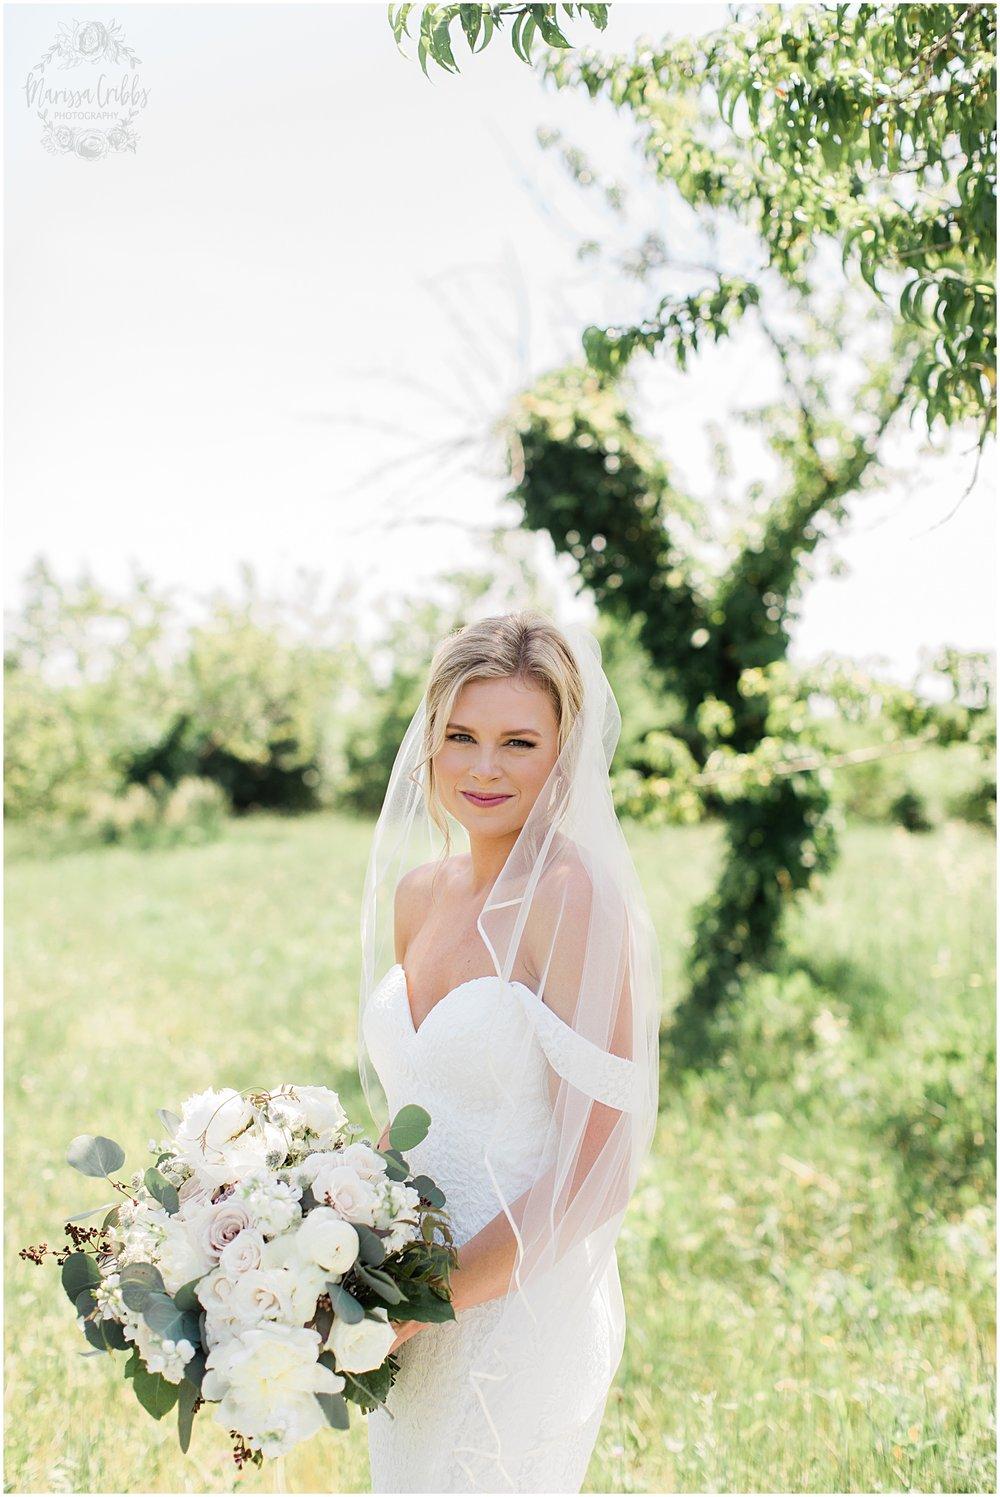 RHODES WEDDING | WESTON RED BARN FARM | MARISSA CRIBBS PHOTOGRAPHY_5237.jpg